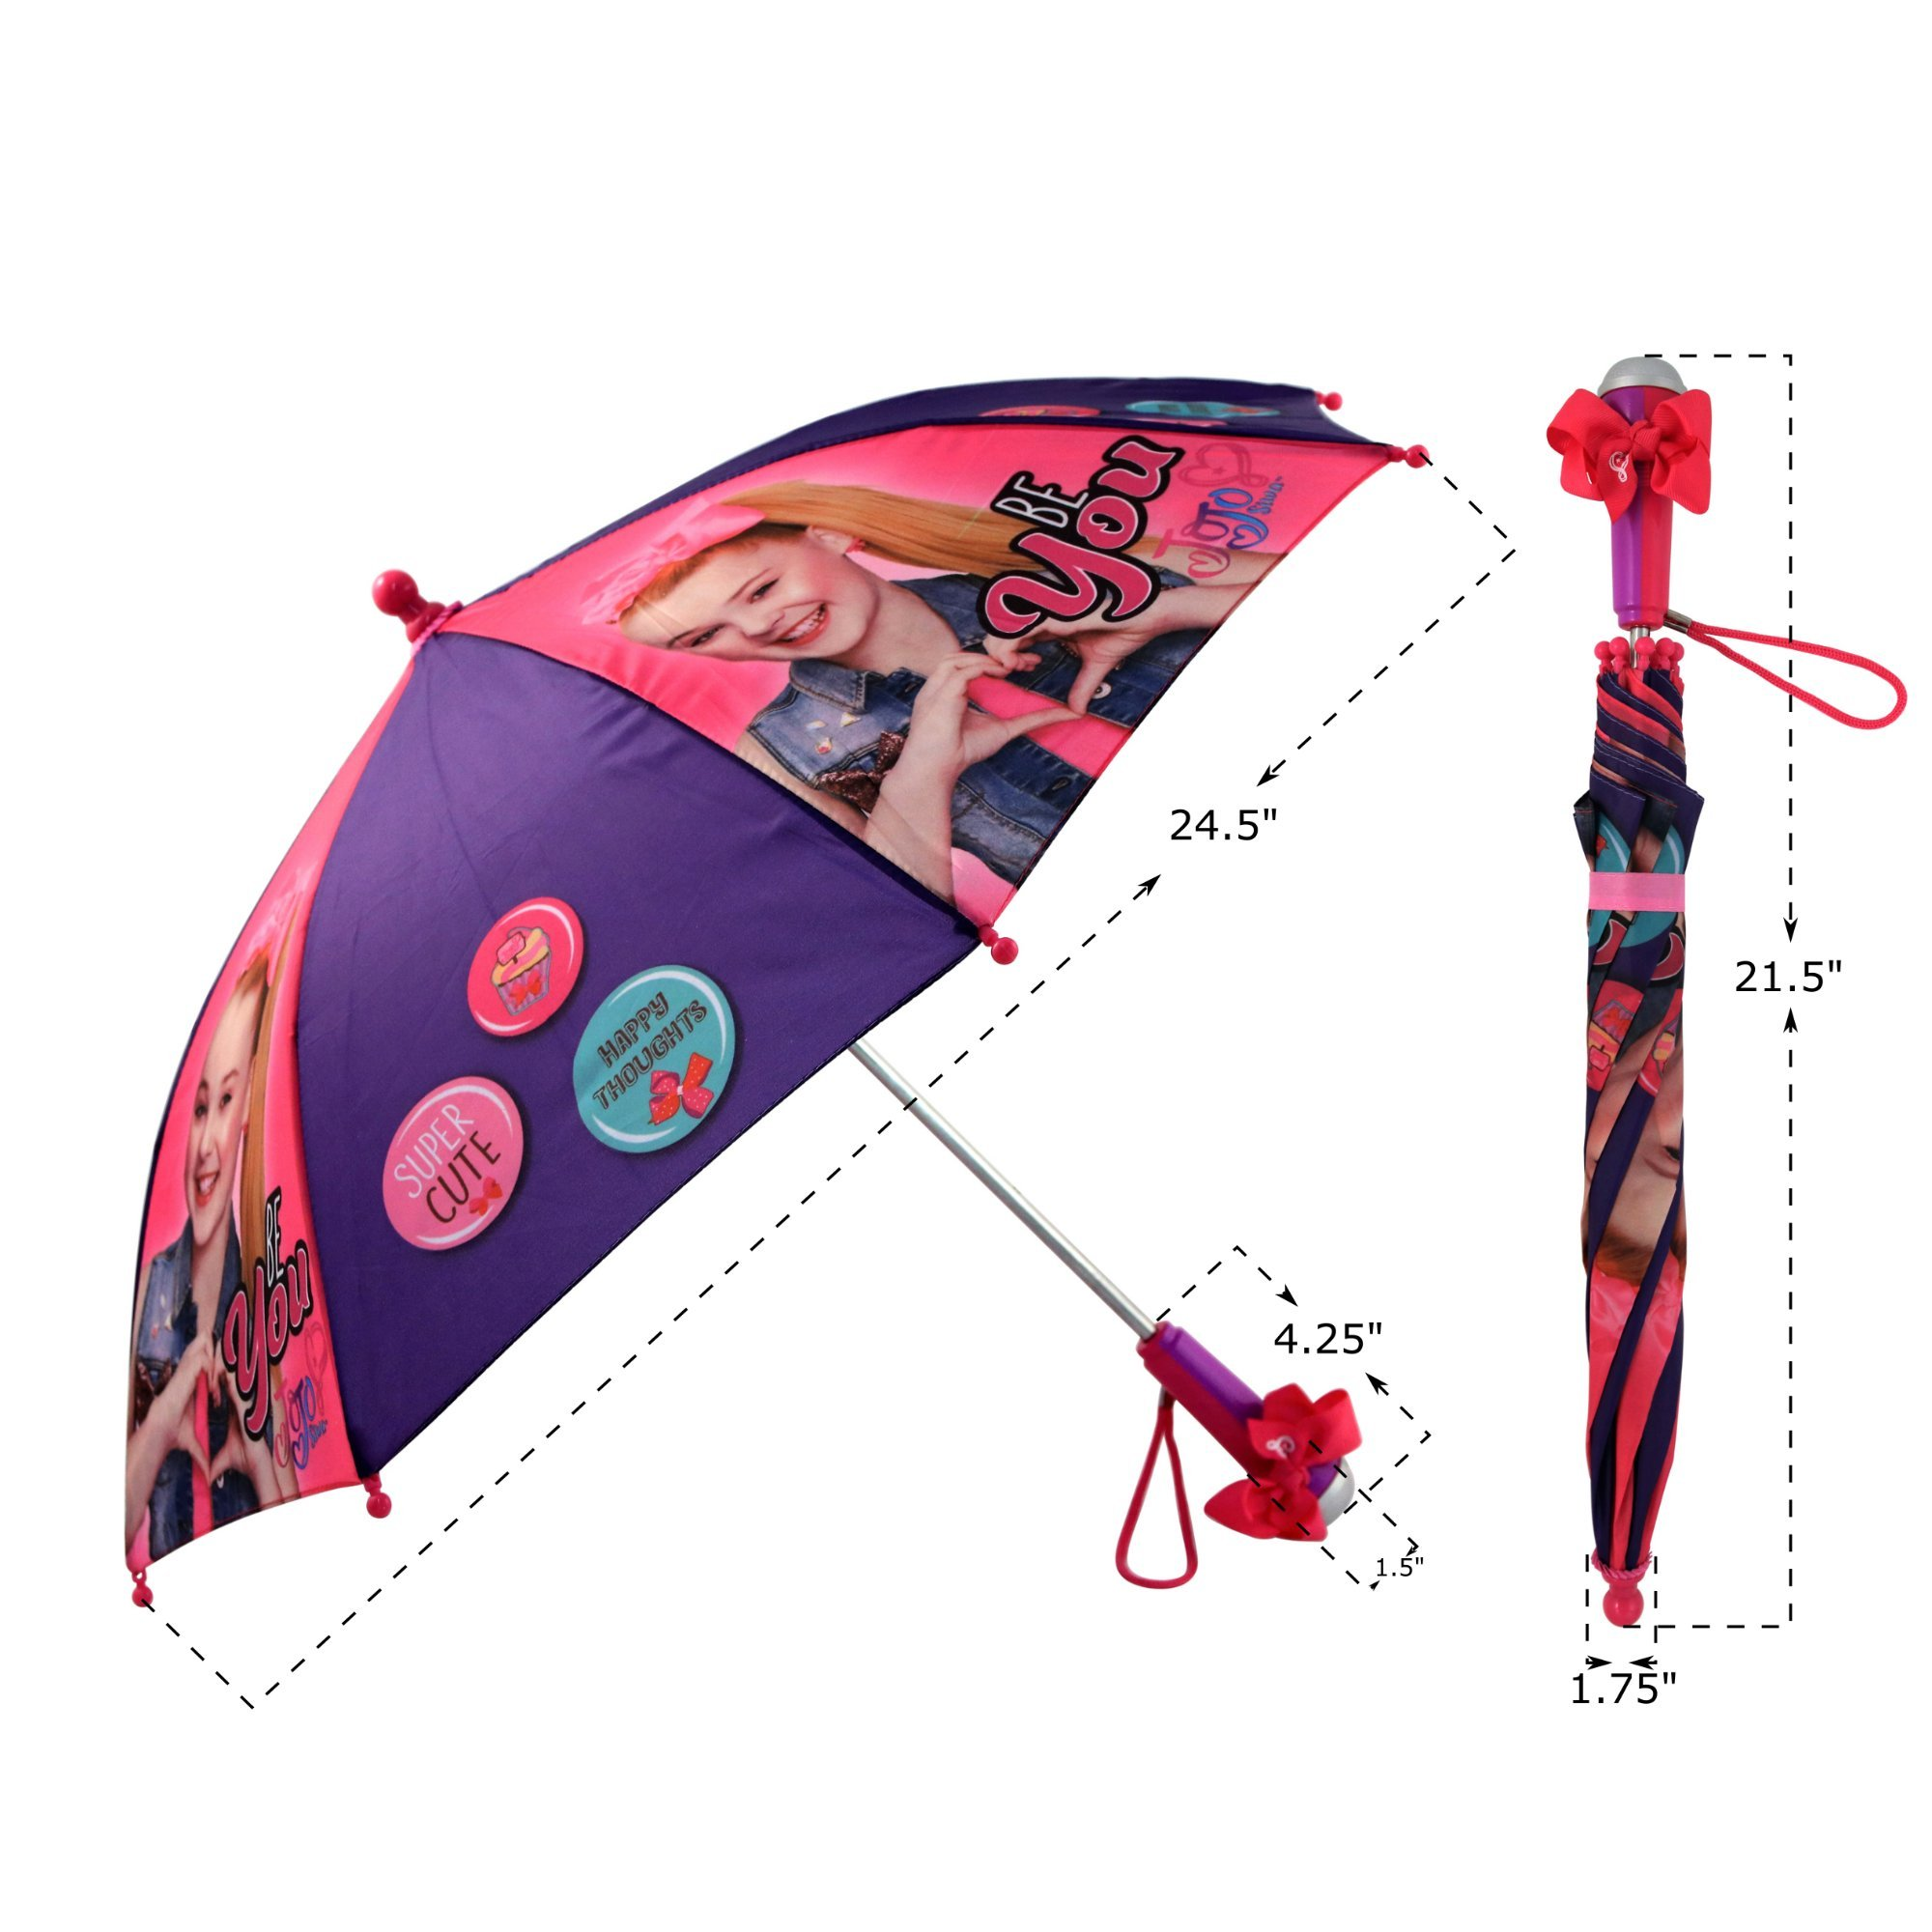 Nickelodeon Little Girls' Jojo Siwa Rainwear Character Umbrella, Purple/Pink, Age 3-7 by Nickelodeon (Image #7)